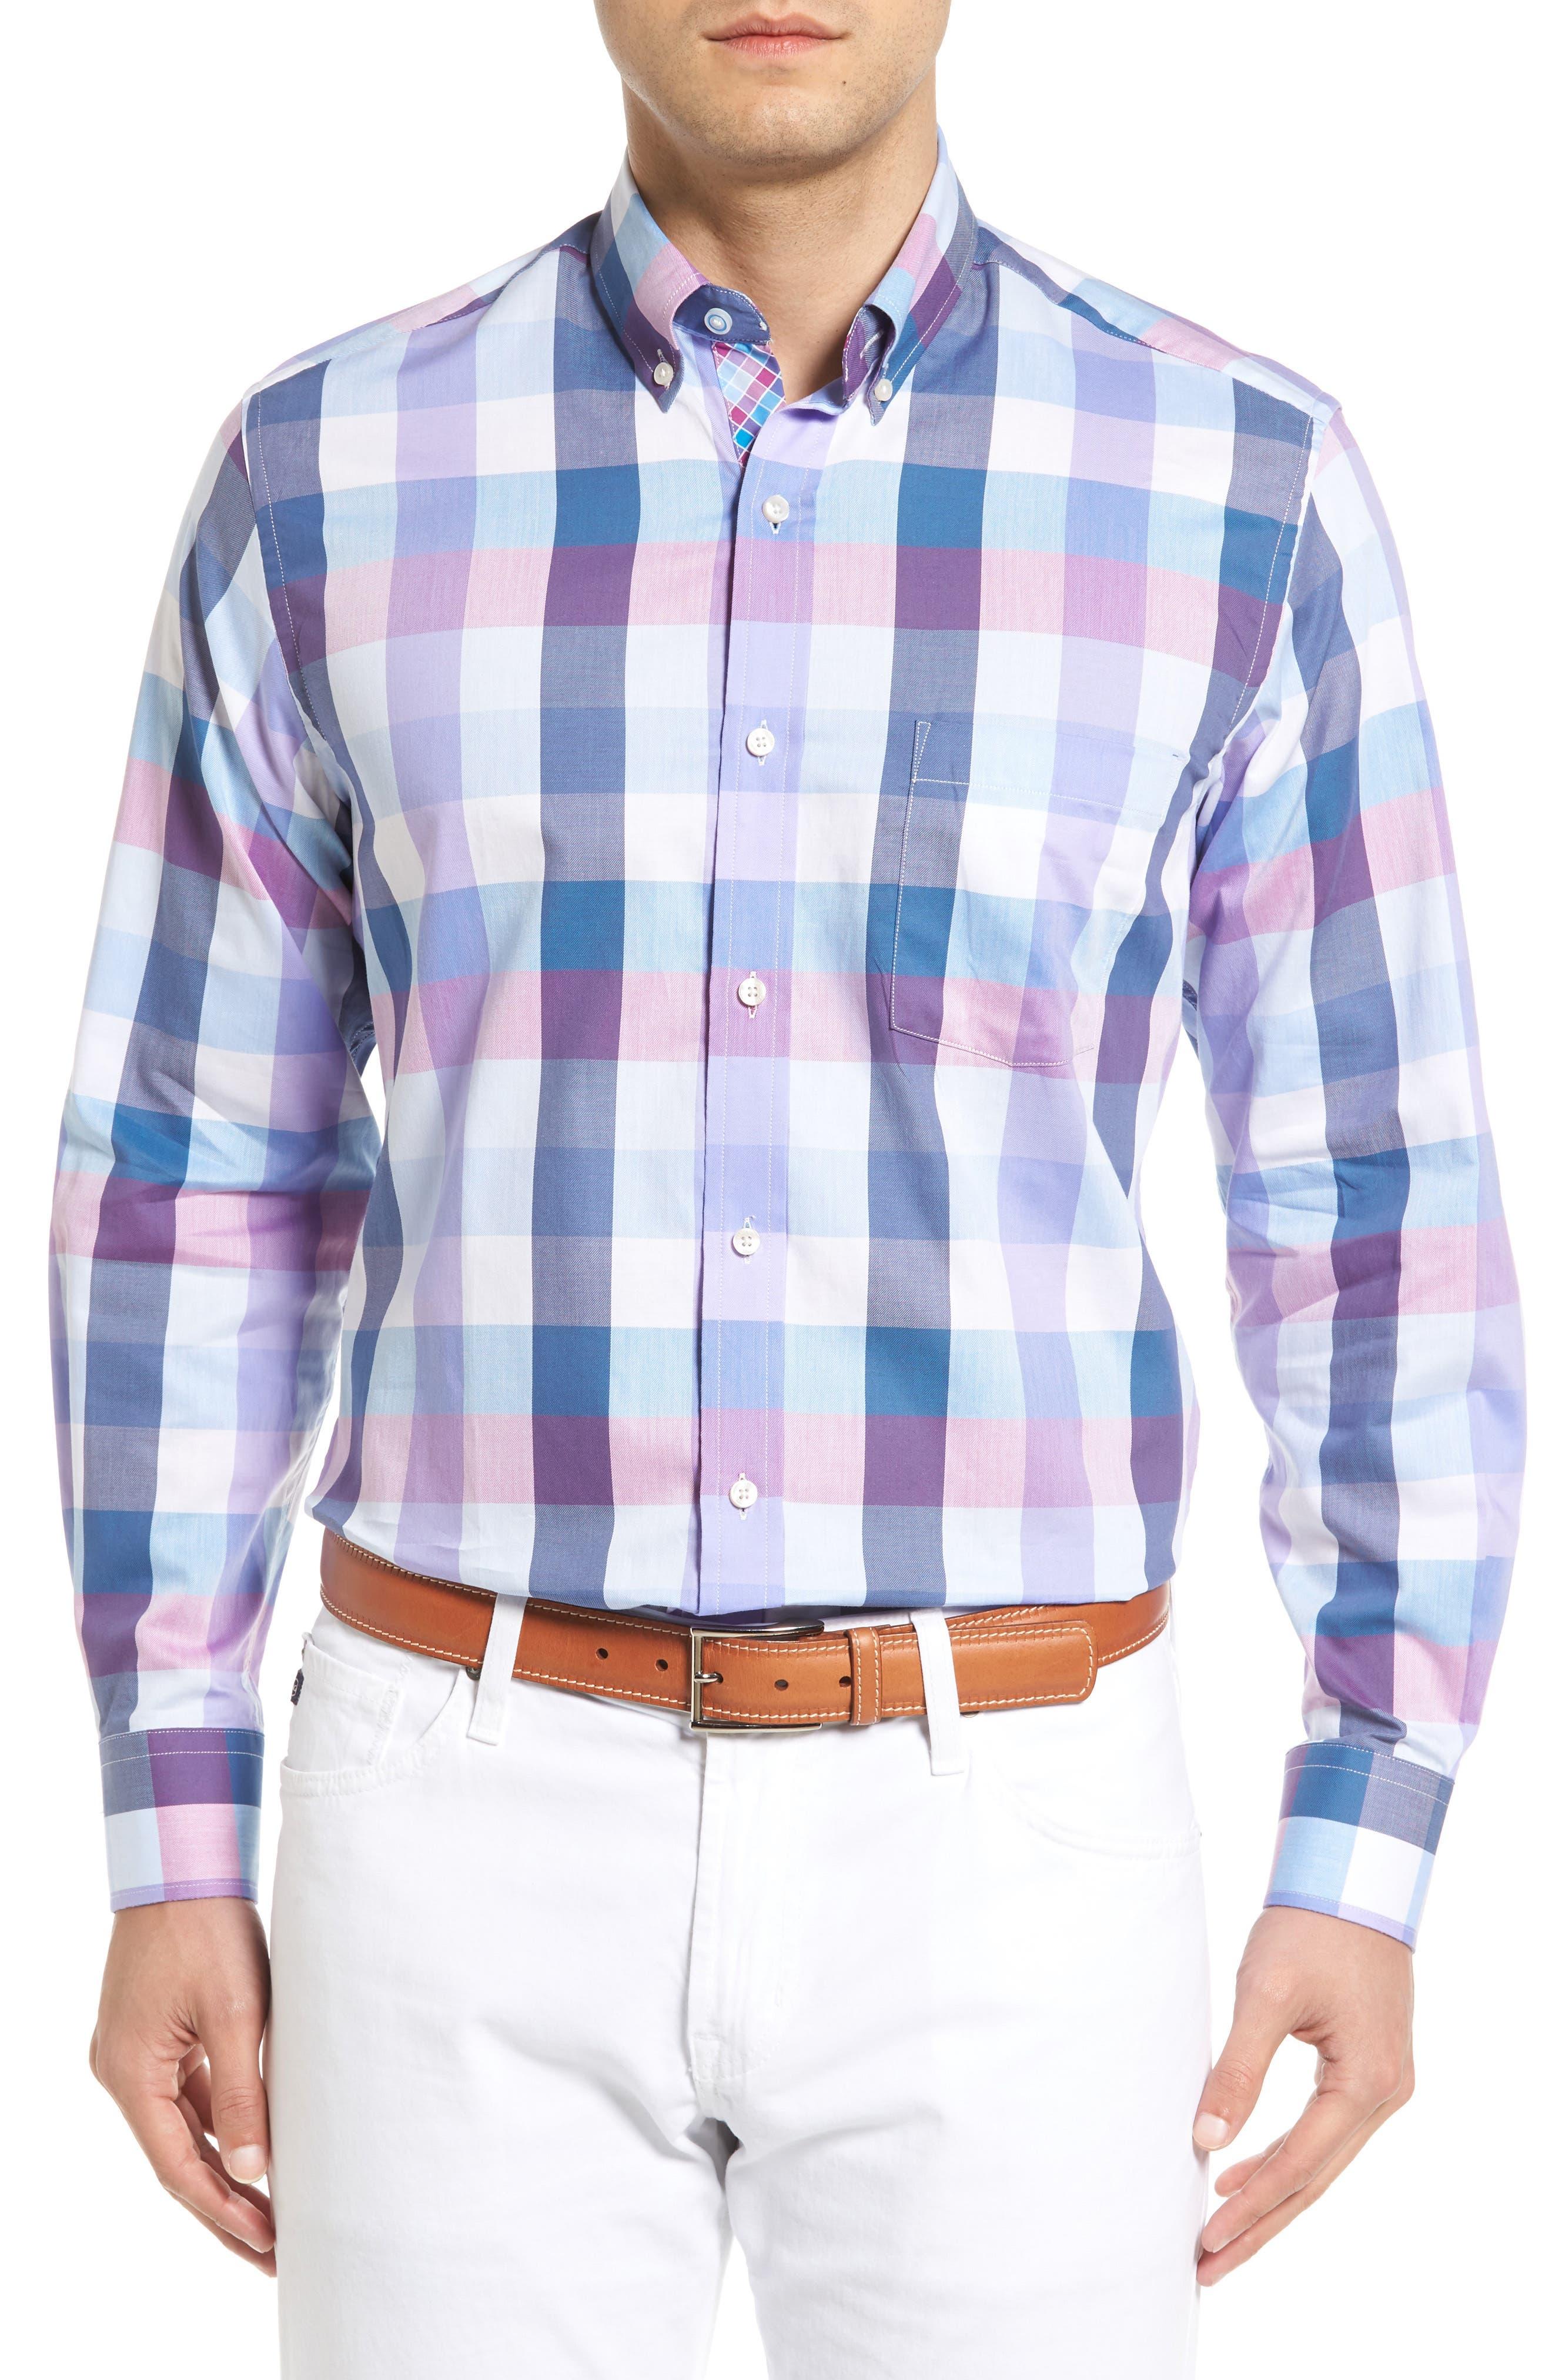 Accona Regular Fit Buffalo Check Sport Shirt,                         Main,                         color, Light Blue